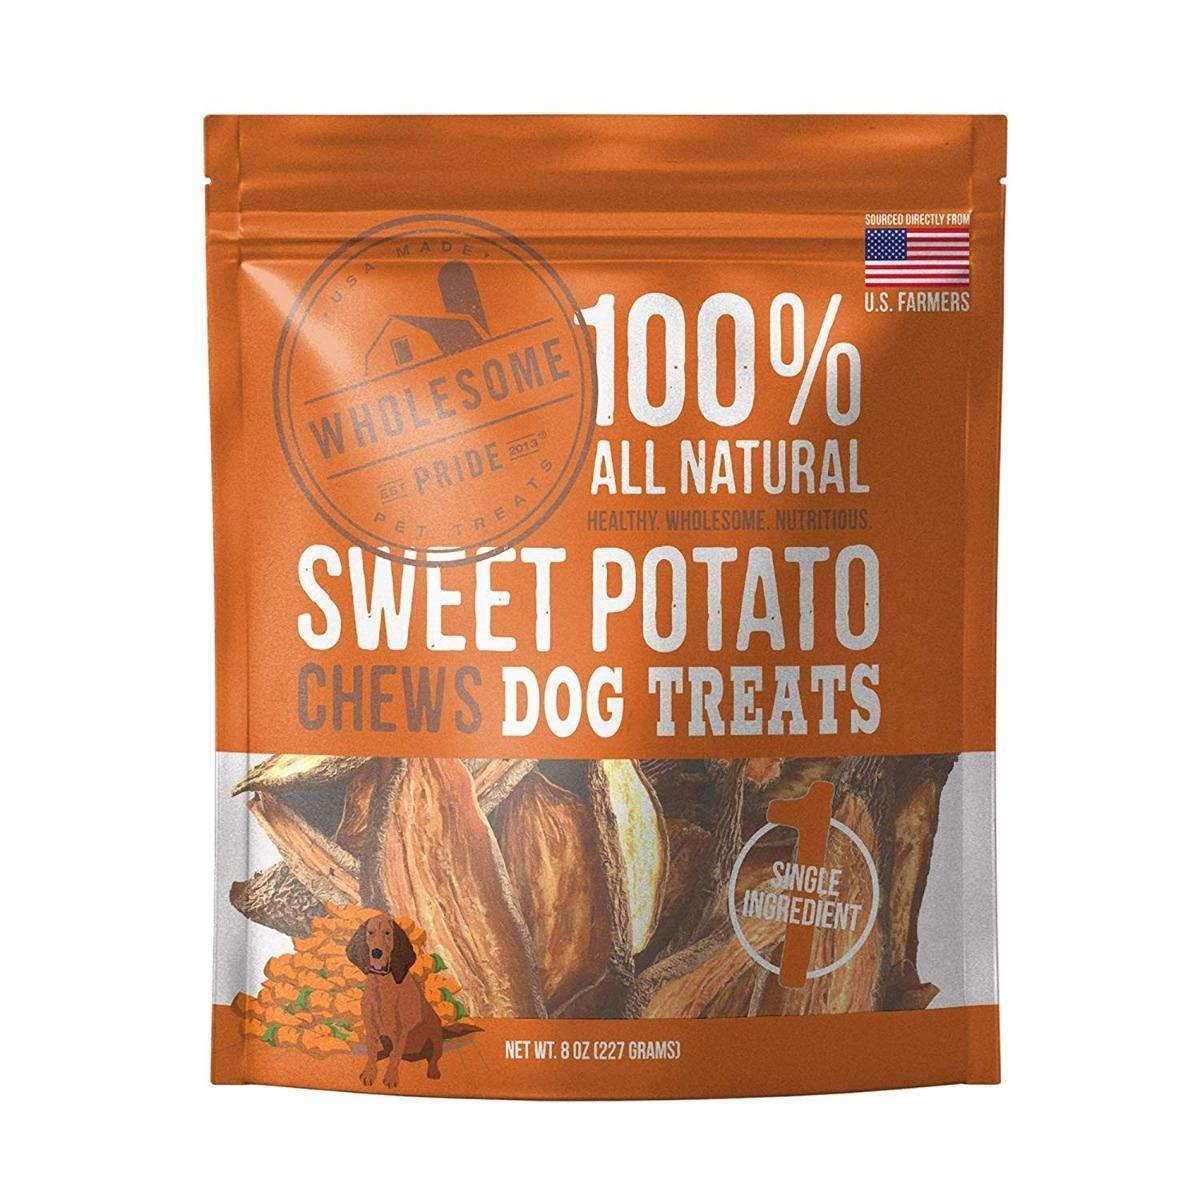 Wholesome Pride Chews Dog Treats - Sweet Potato